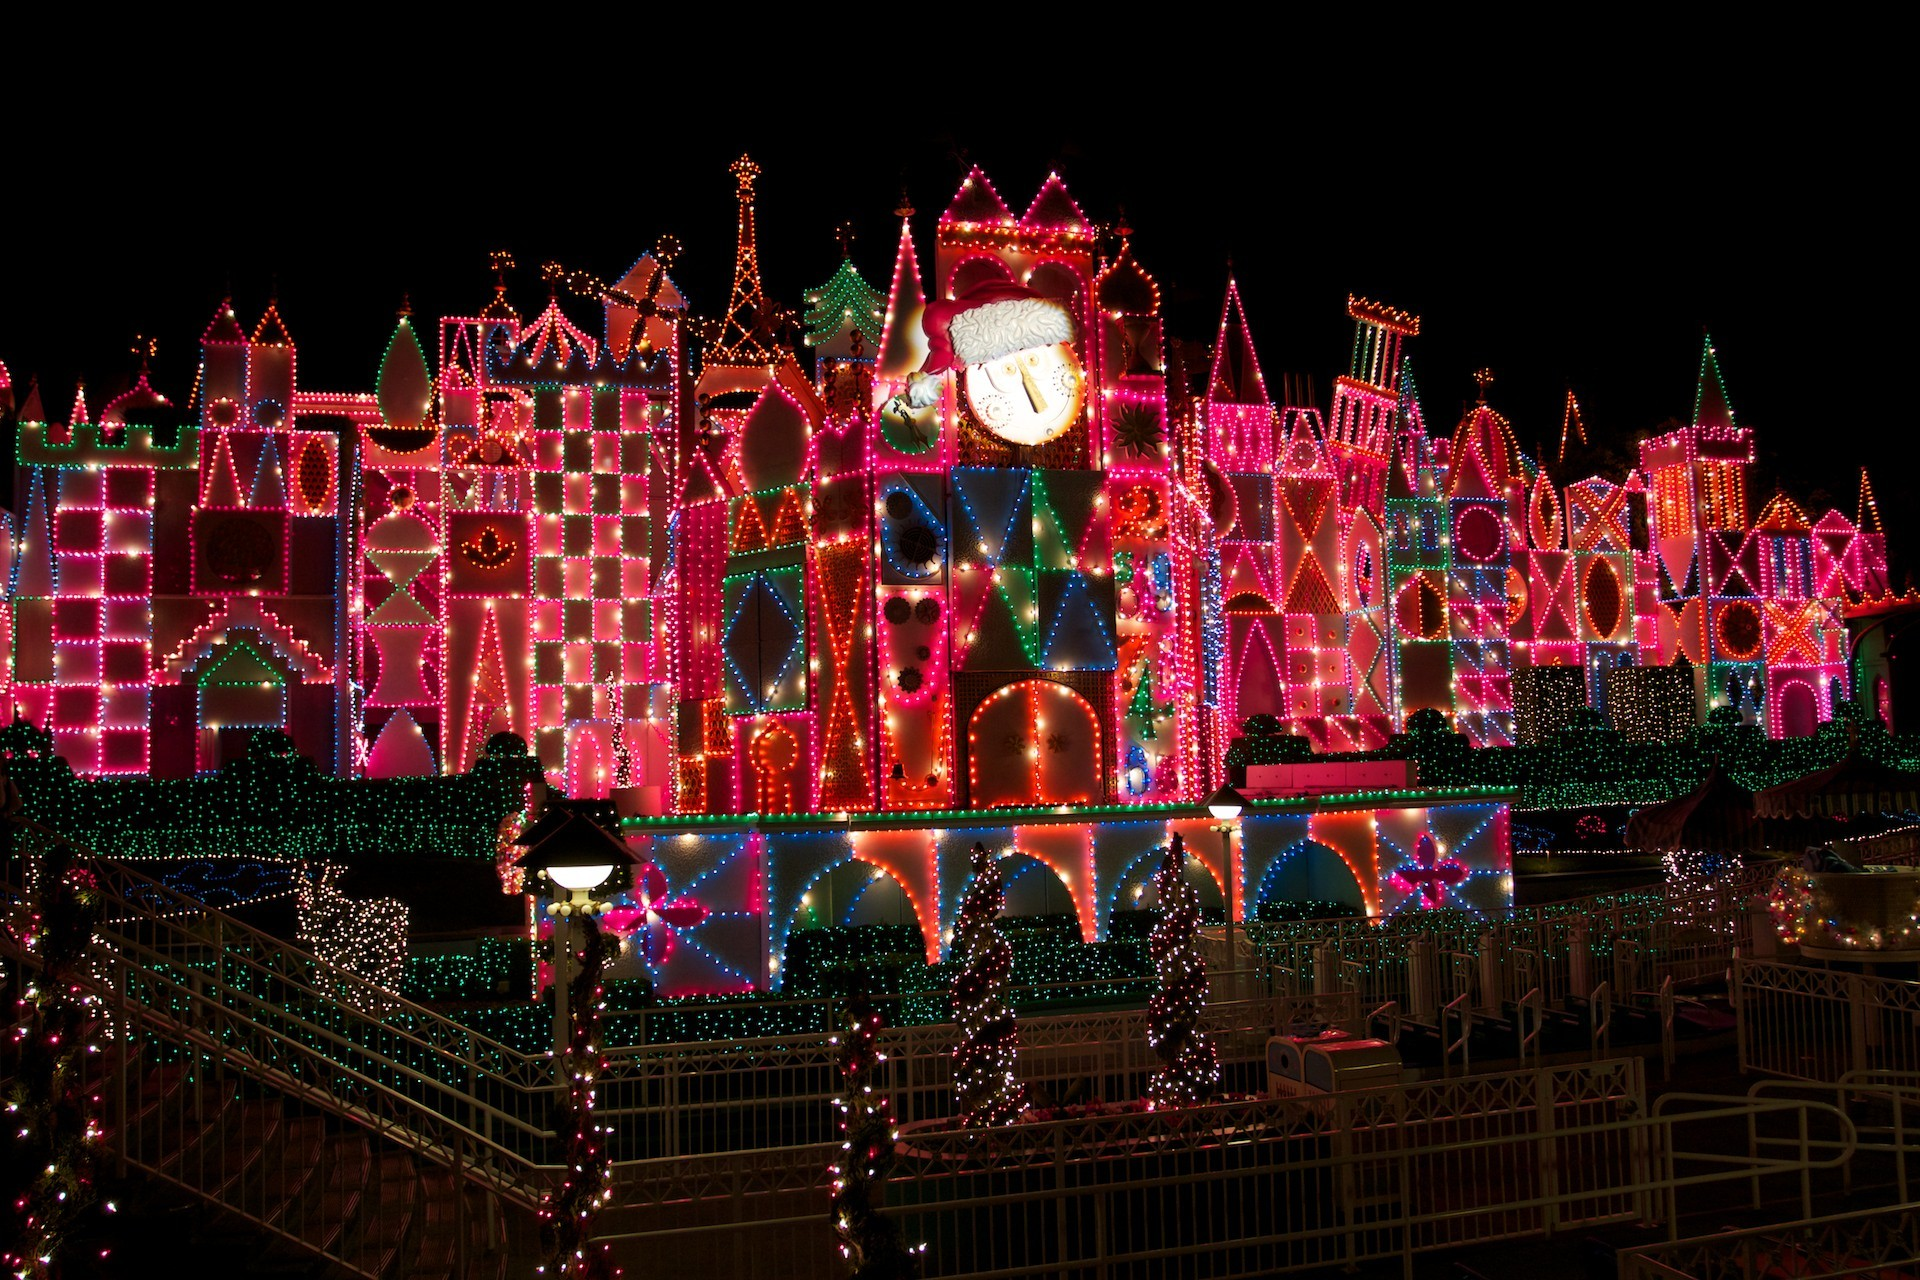 Disneyland It's a Small World Christmas Lights Desktop Wallpaper